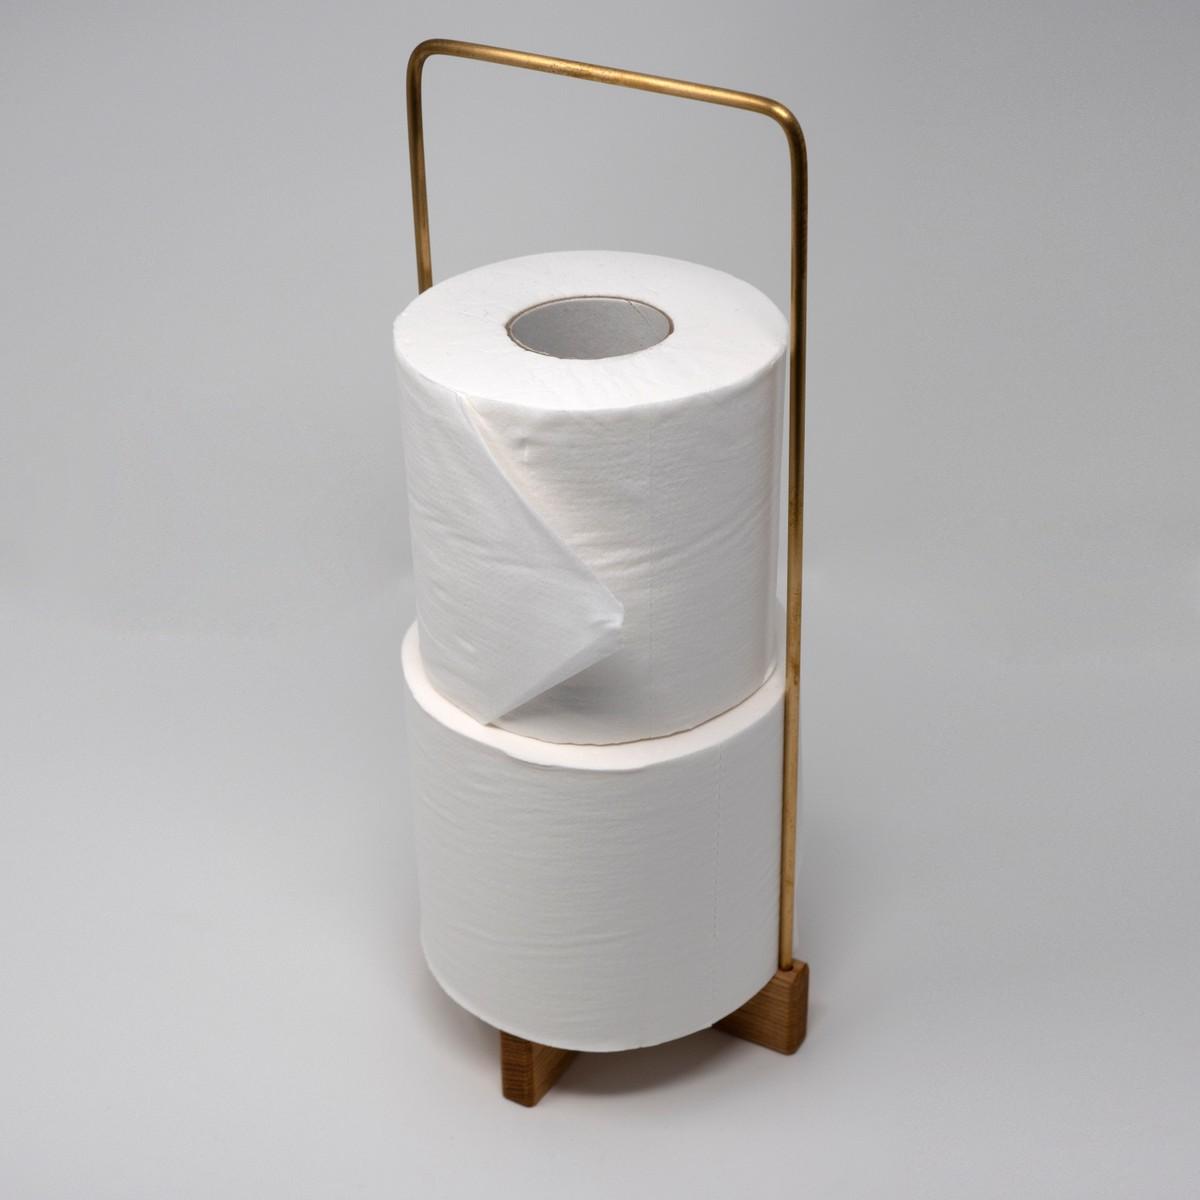 Photo of Tamo Ash Toilet Paper Stand